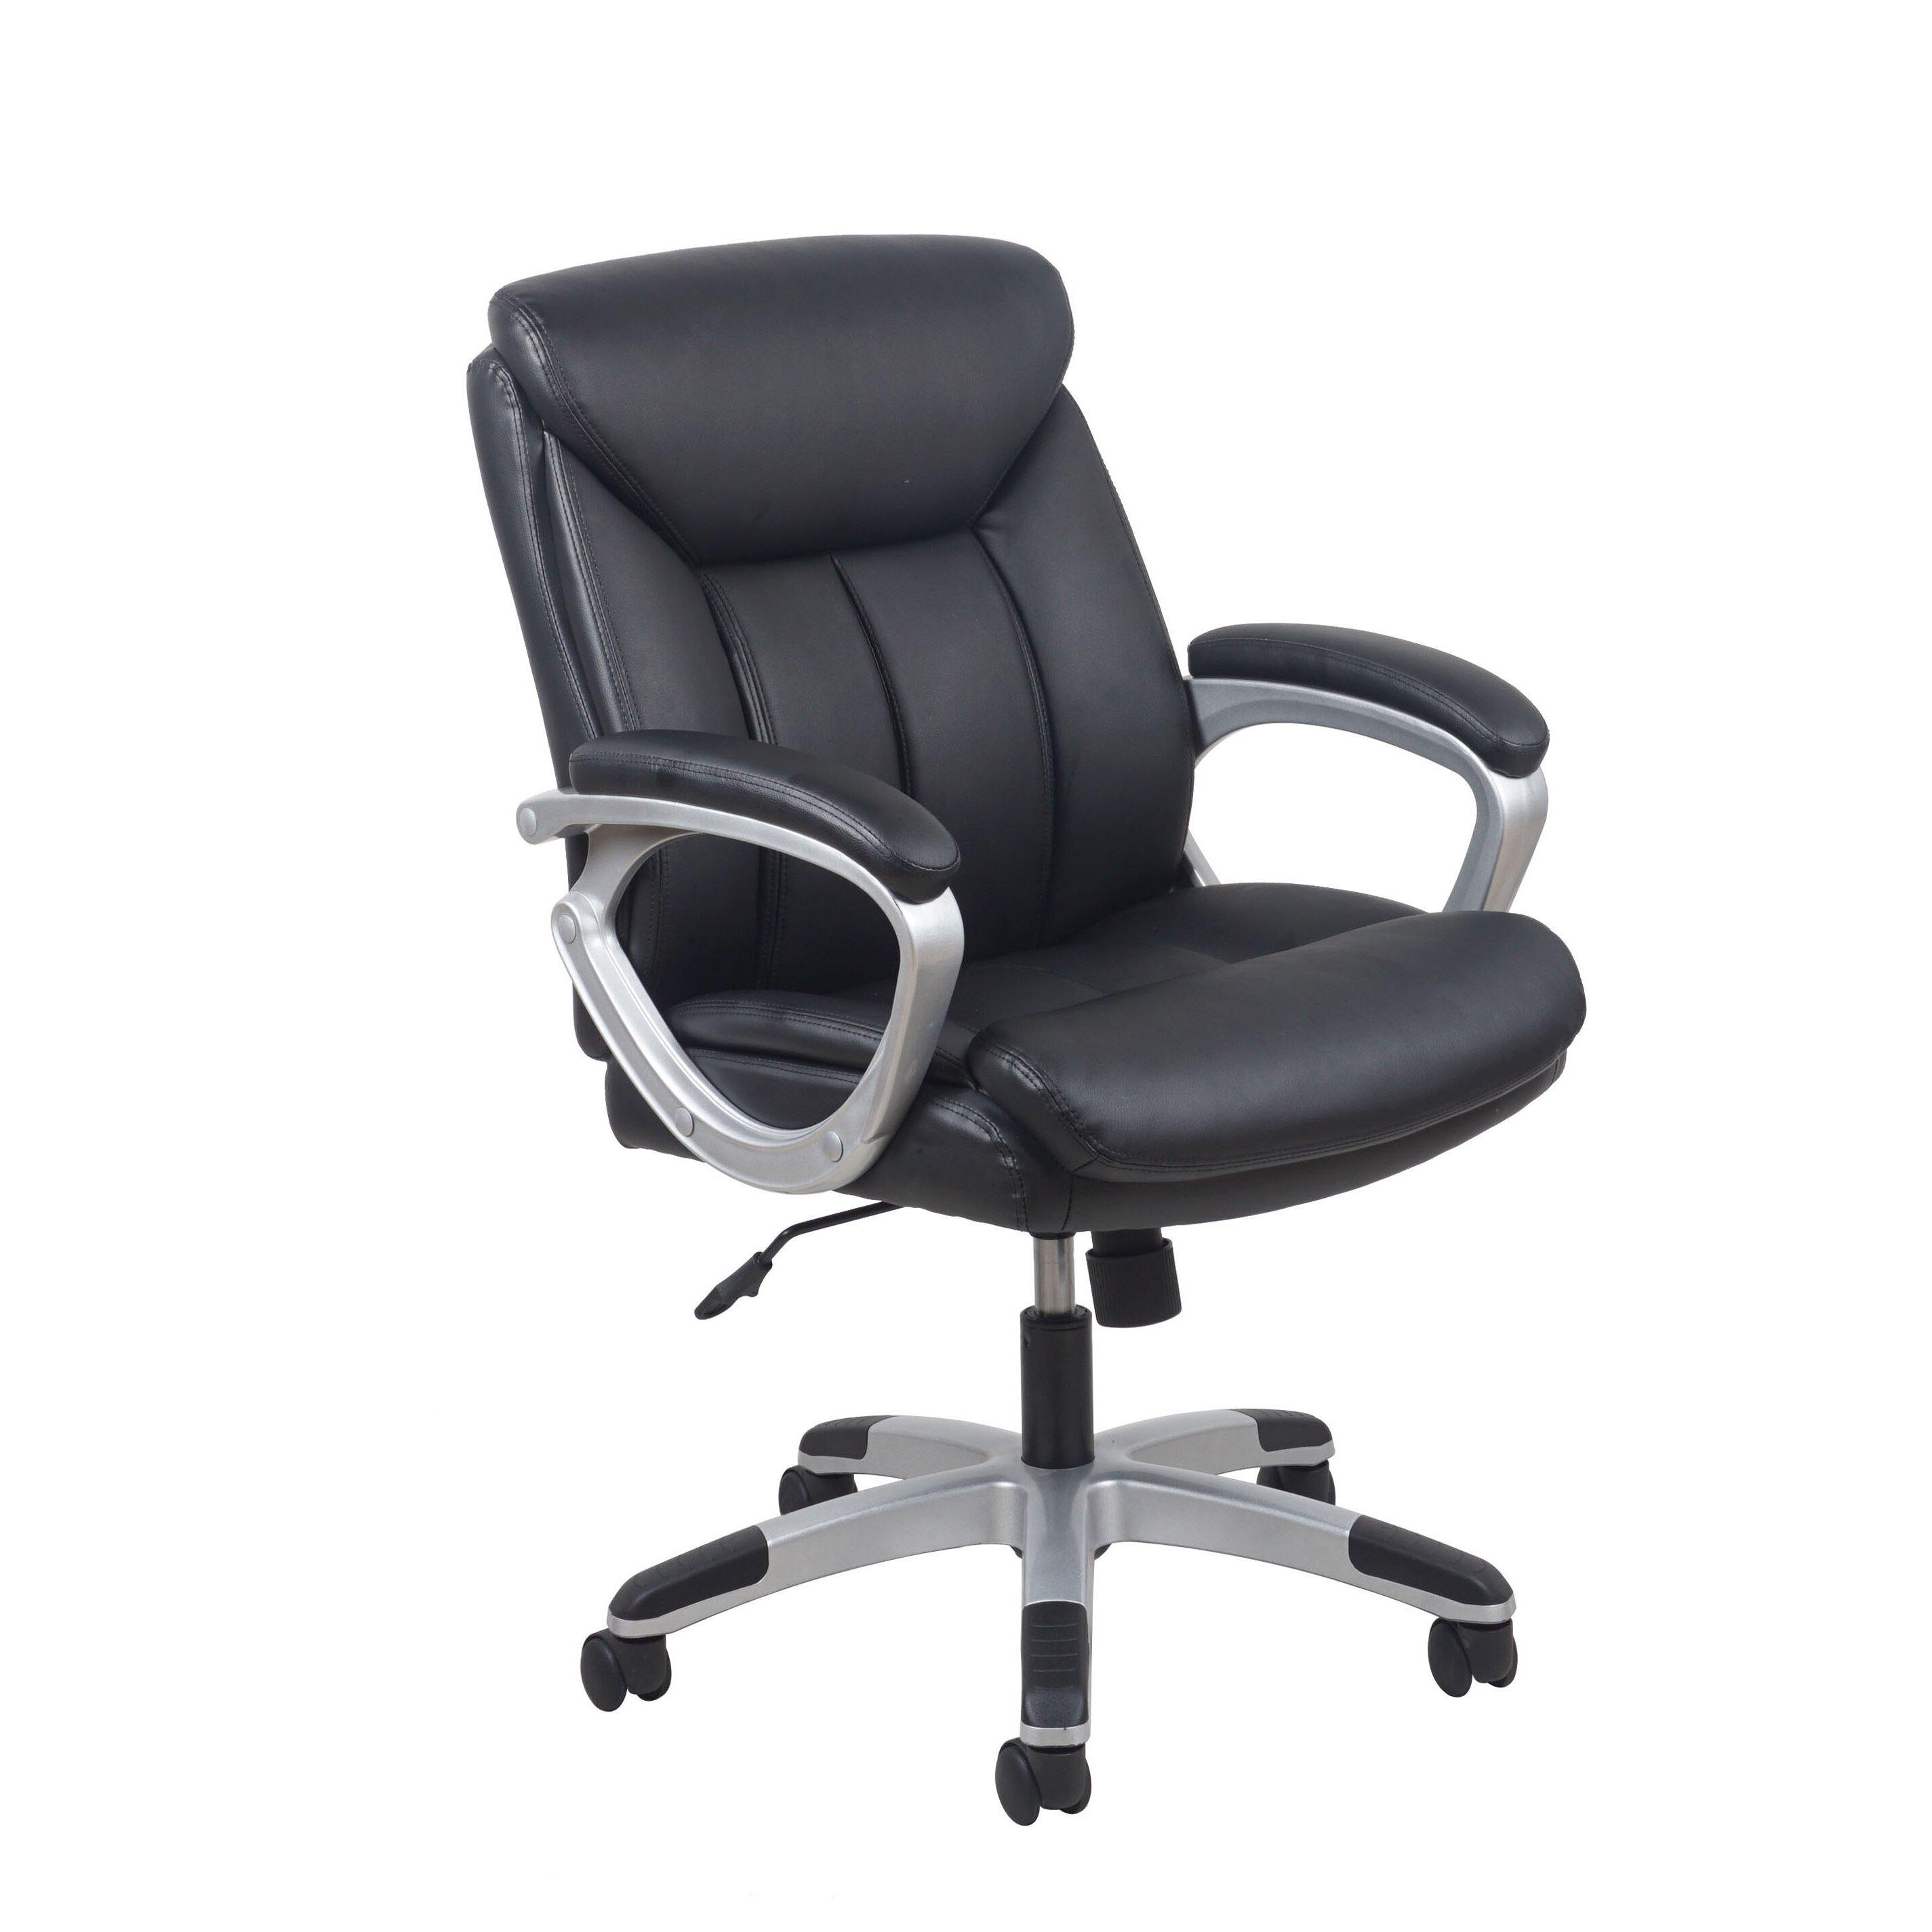 ofm essentials leather executive chair reviews wayfair. Black Bedroom Furniture Sets. Home Design Ideas